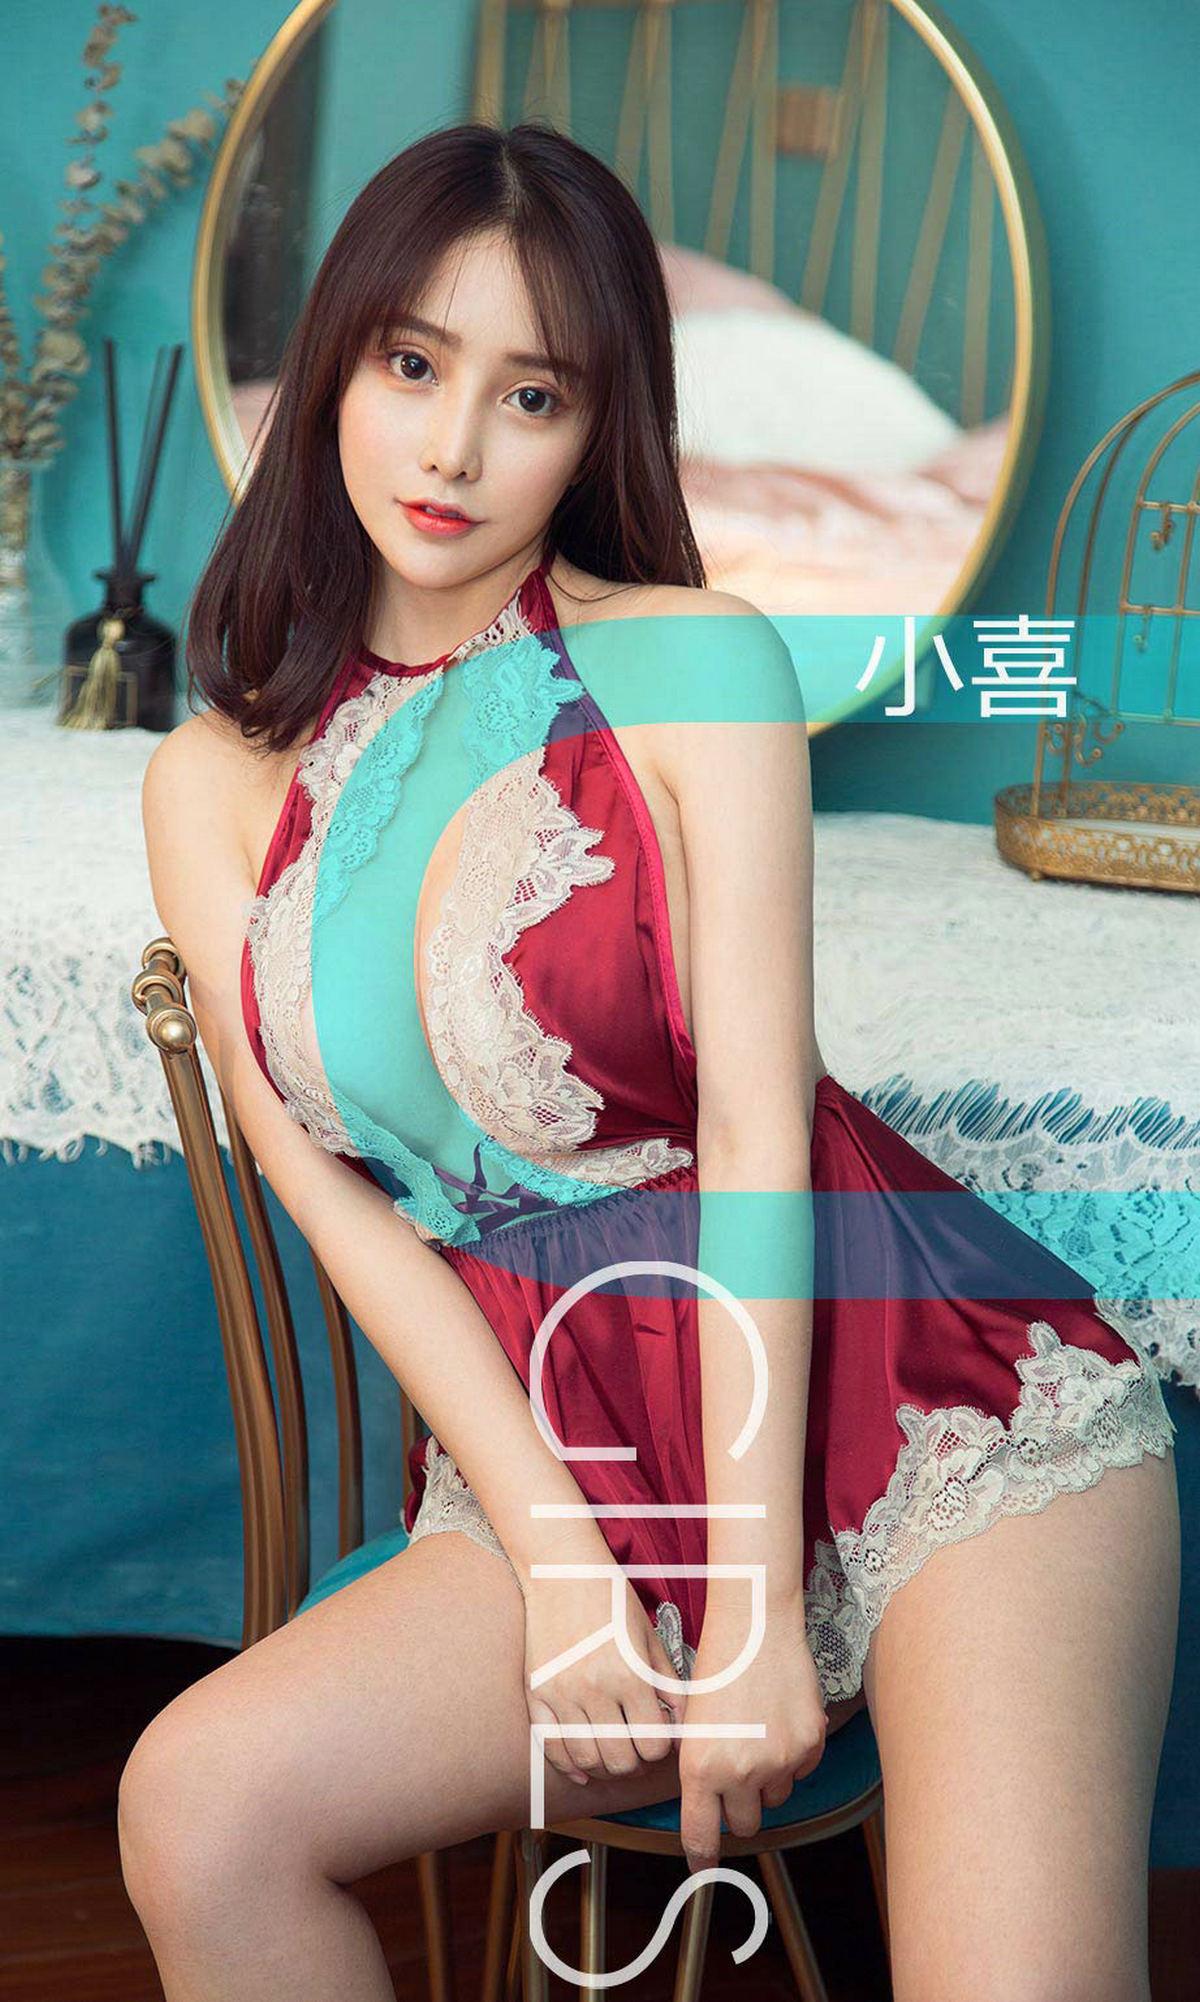 [Ugirls]爱尤物 No.1393 藏不住 小喜 [35